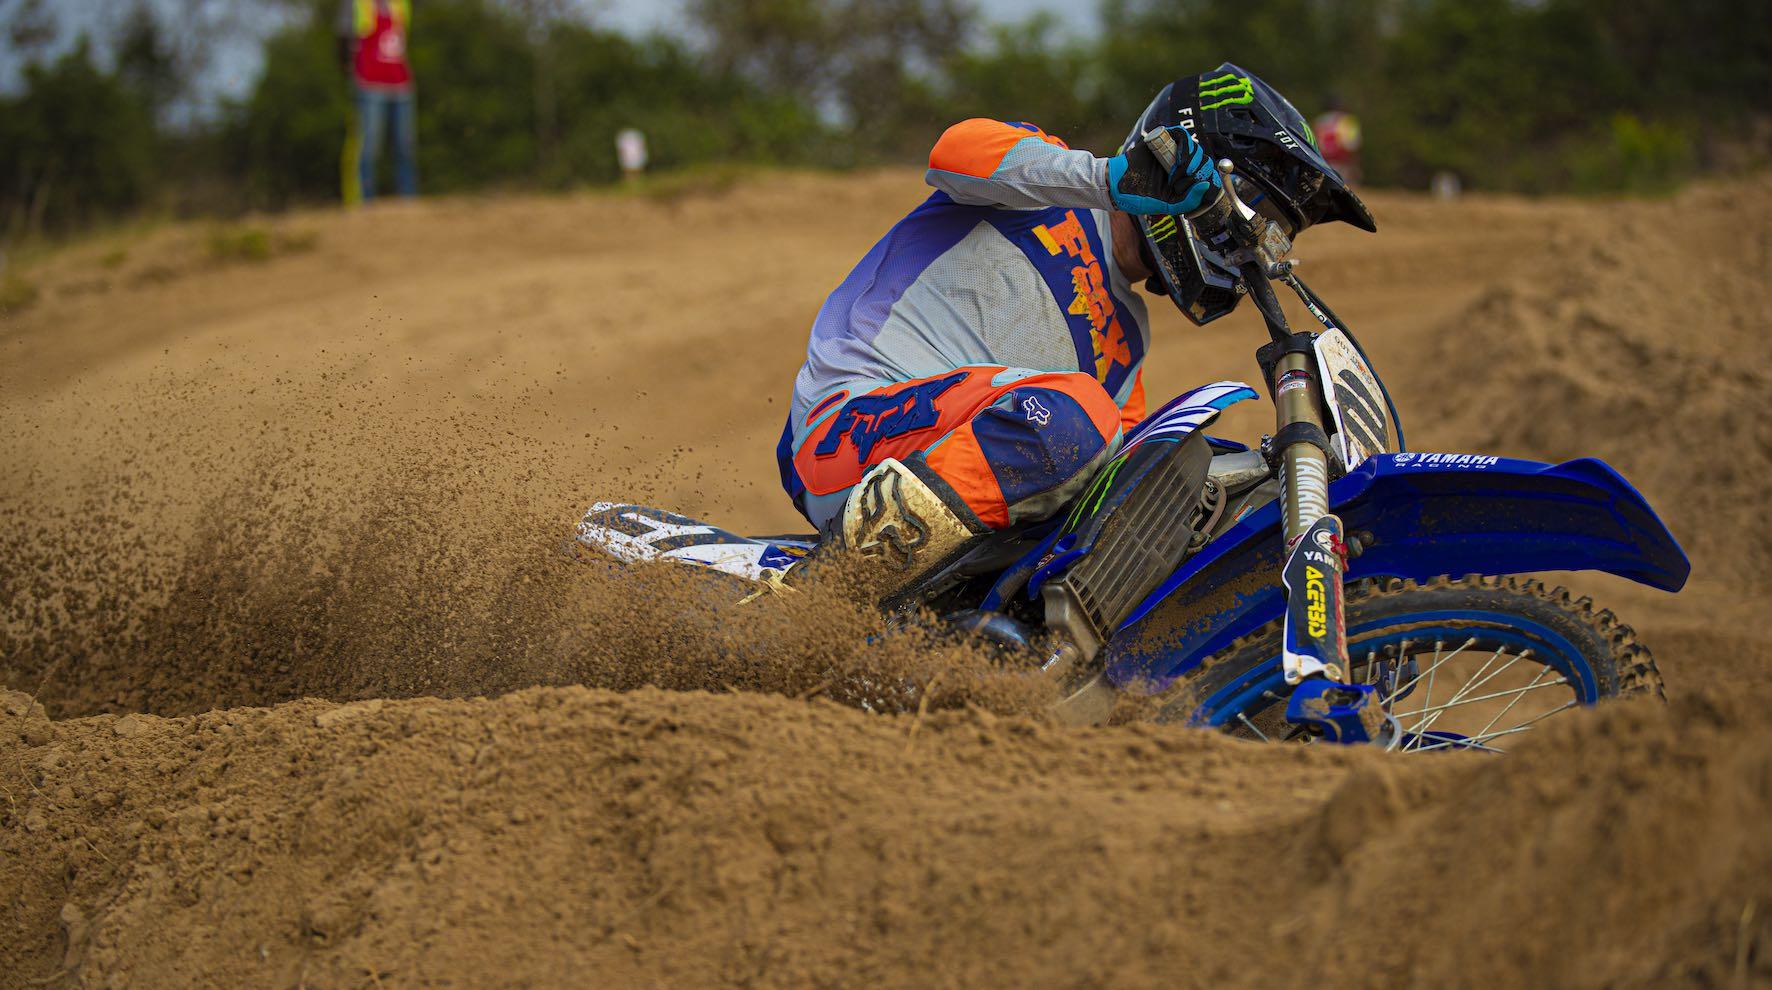 David Goosen winning the MX1 class at Round 1 of the 2020 SA Motocross Nationals